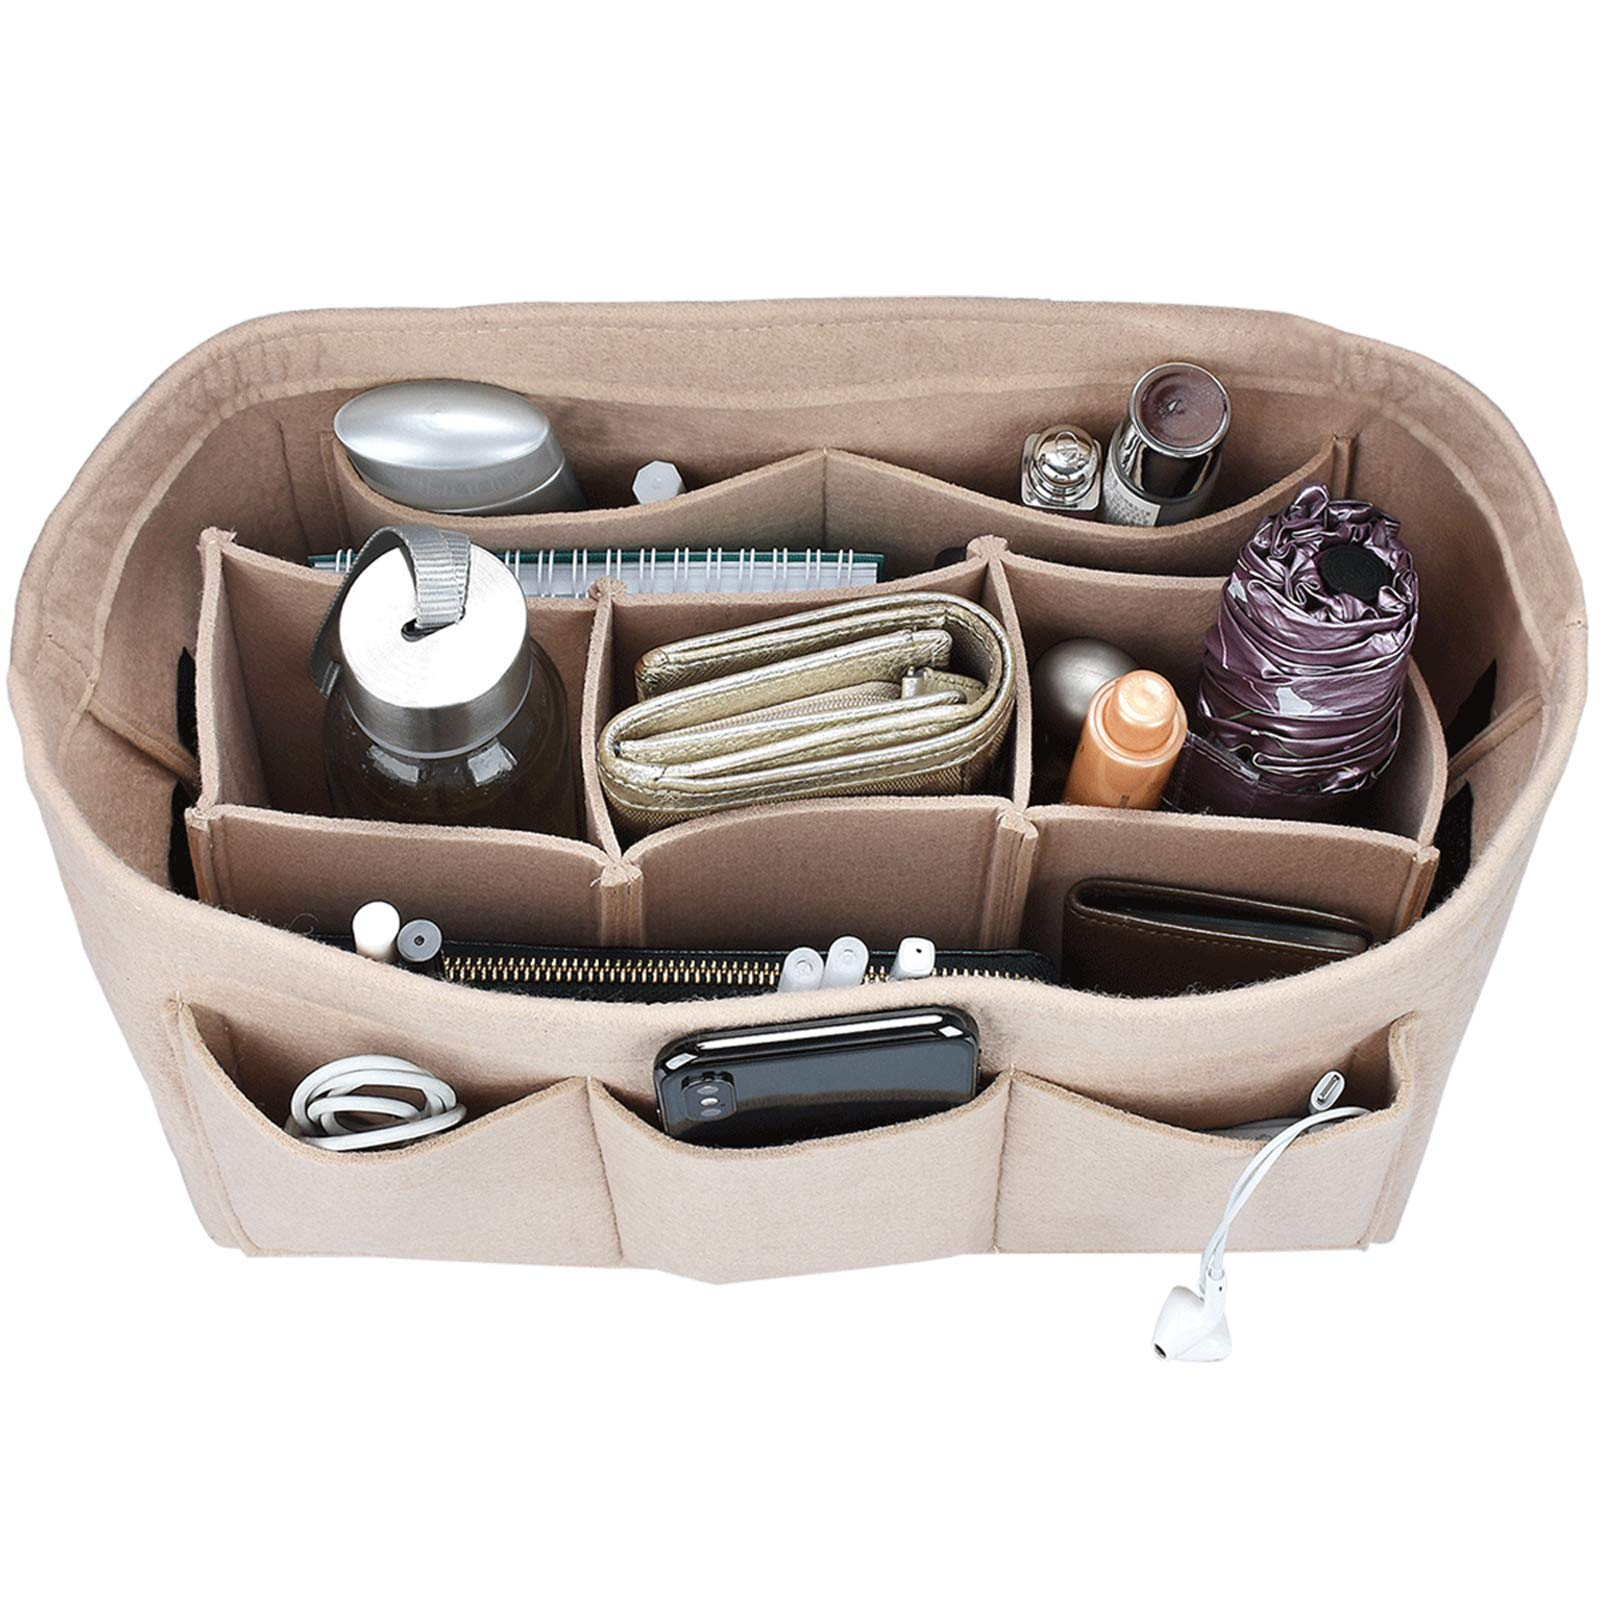 Felt Purse Insert Organizer, Handbag organizer, Bag in Bag for Handbag Purse Tote, Diaper Bag Organizer, Stand on Its Own, 12 Compartments, 3 Sizes (Medium, Beige)